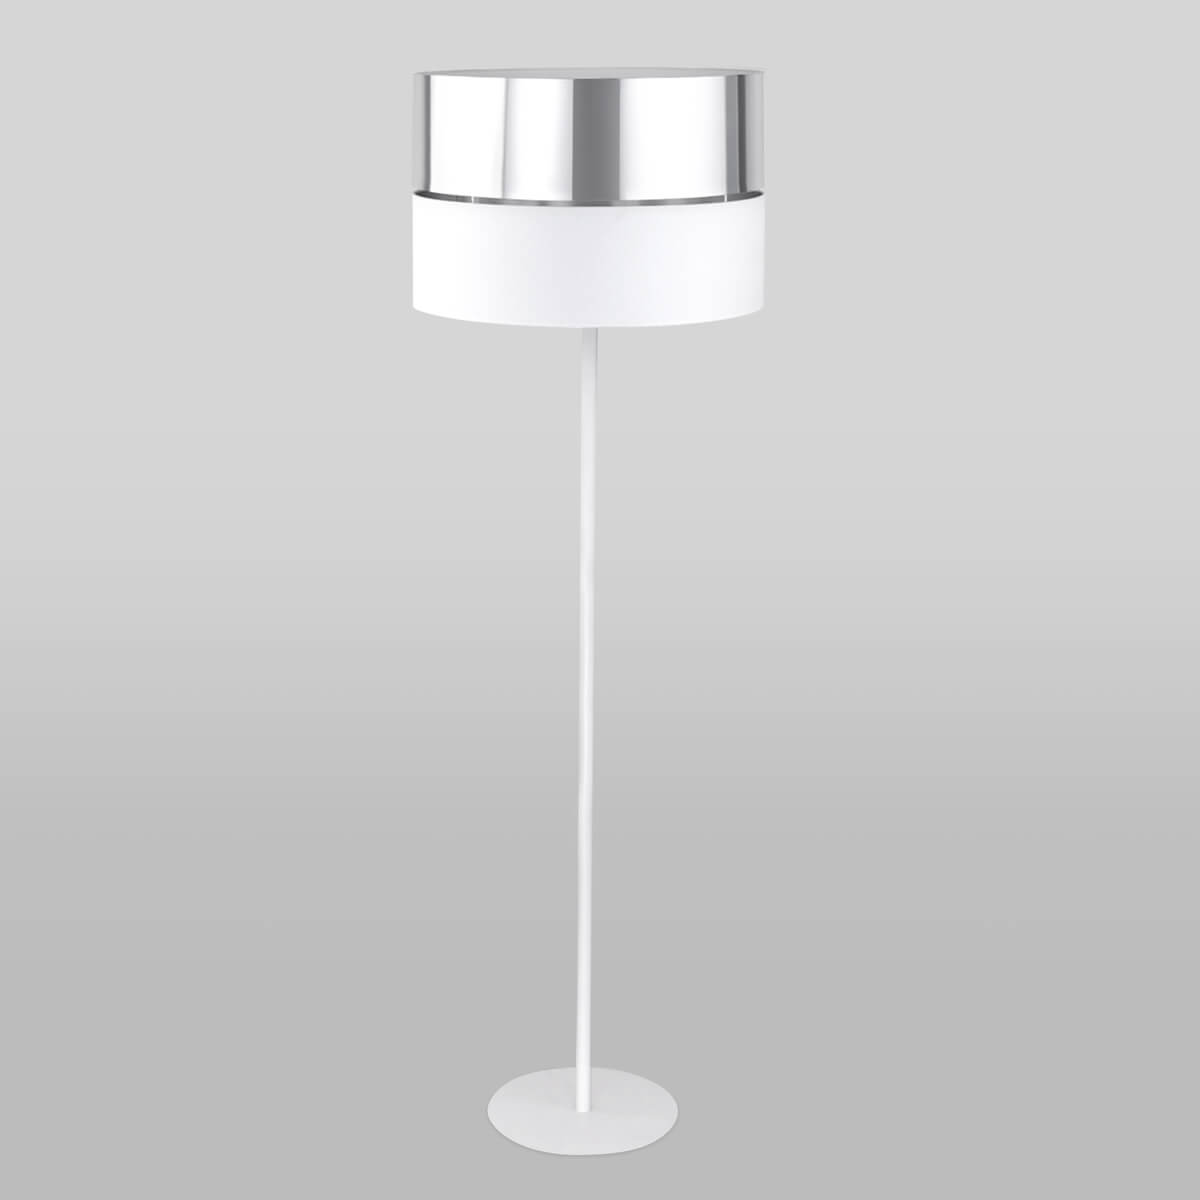 Торшер TK Lighting 5602 Hilton Silver 5602 Hilton Silver цена 2017